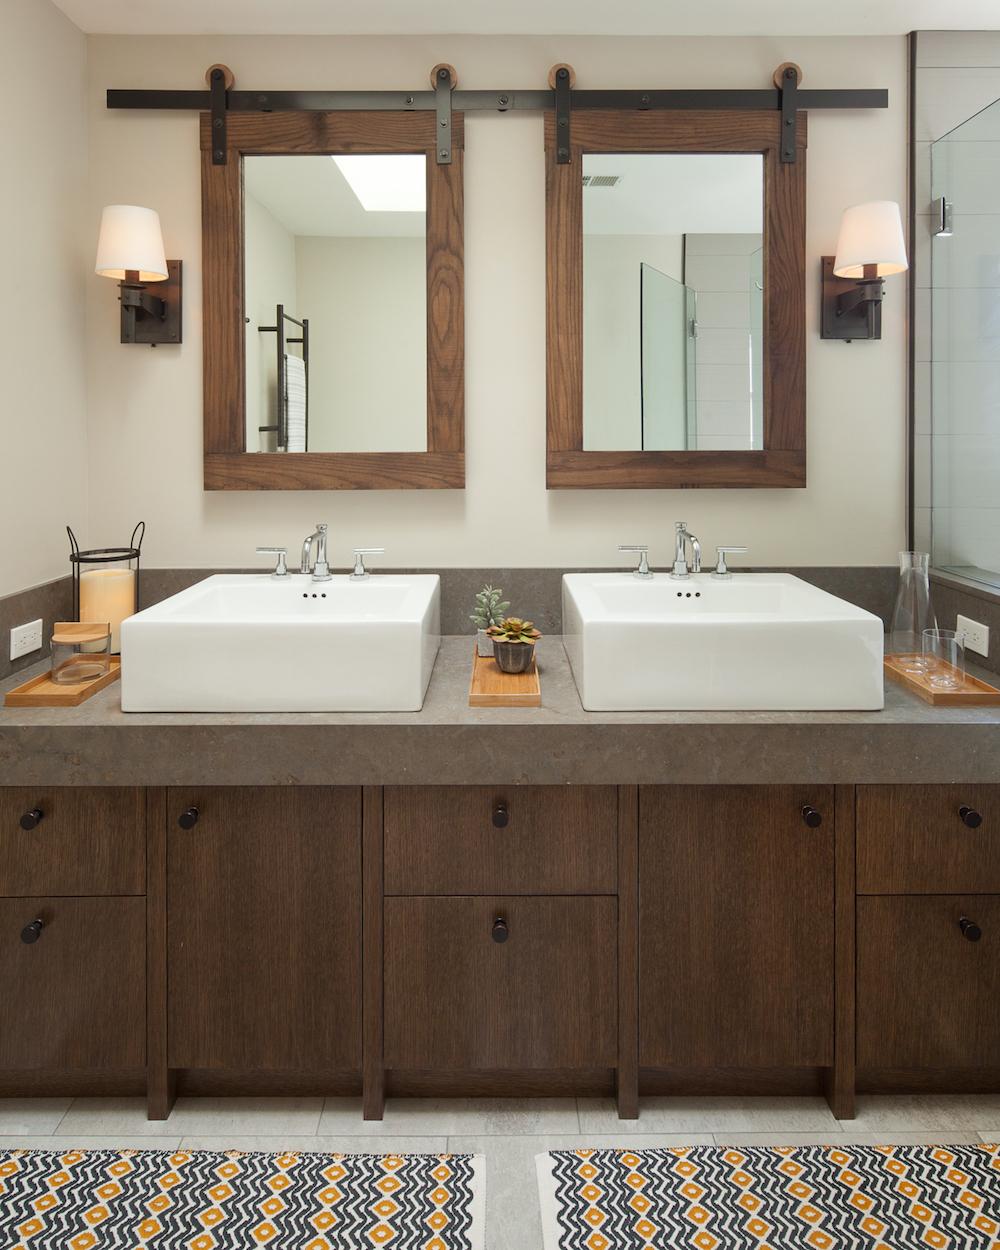 1405-Birch Bath Vanity-2.jpg